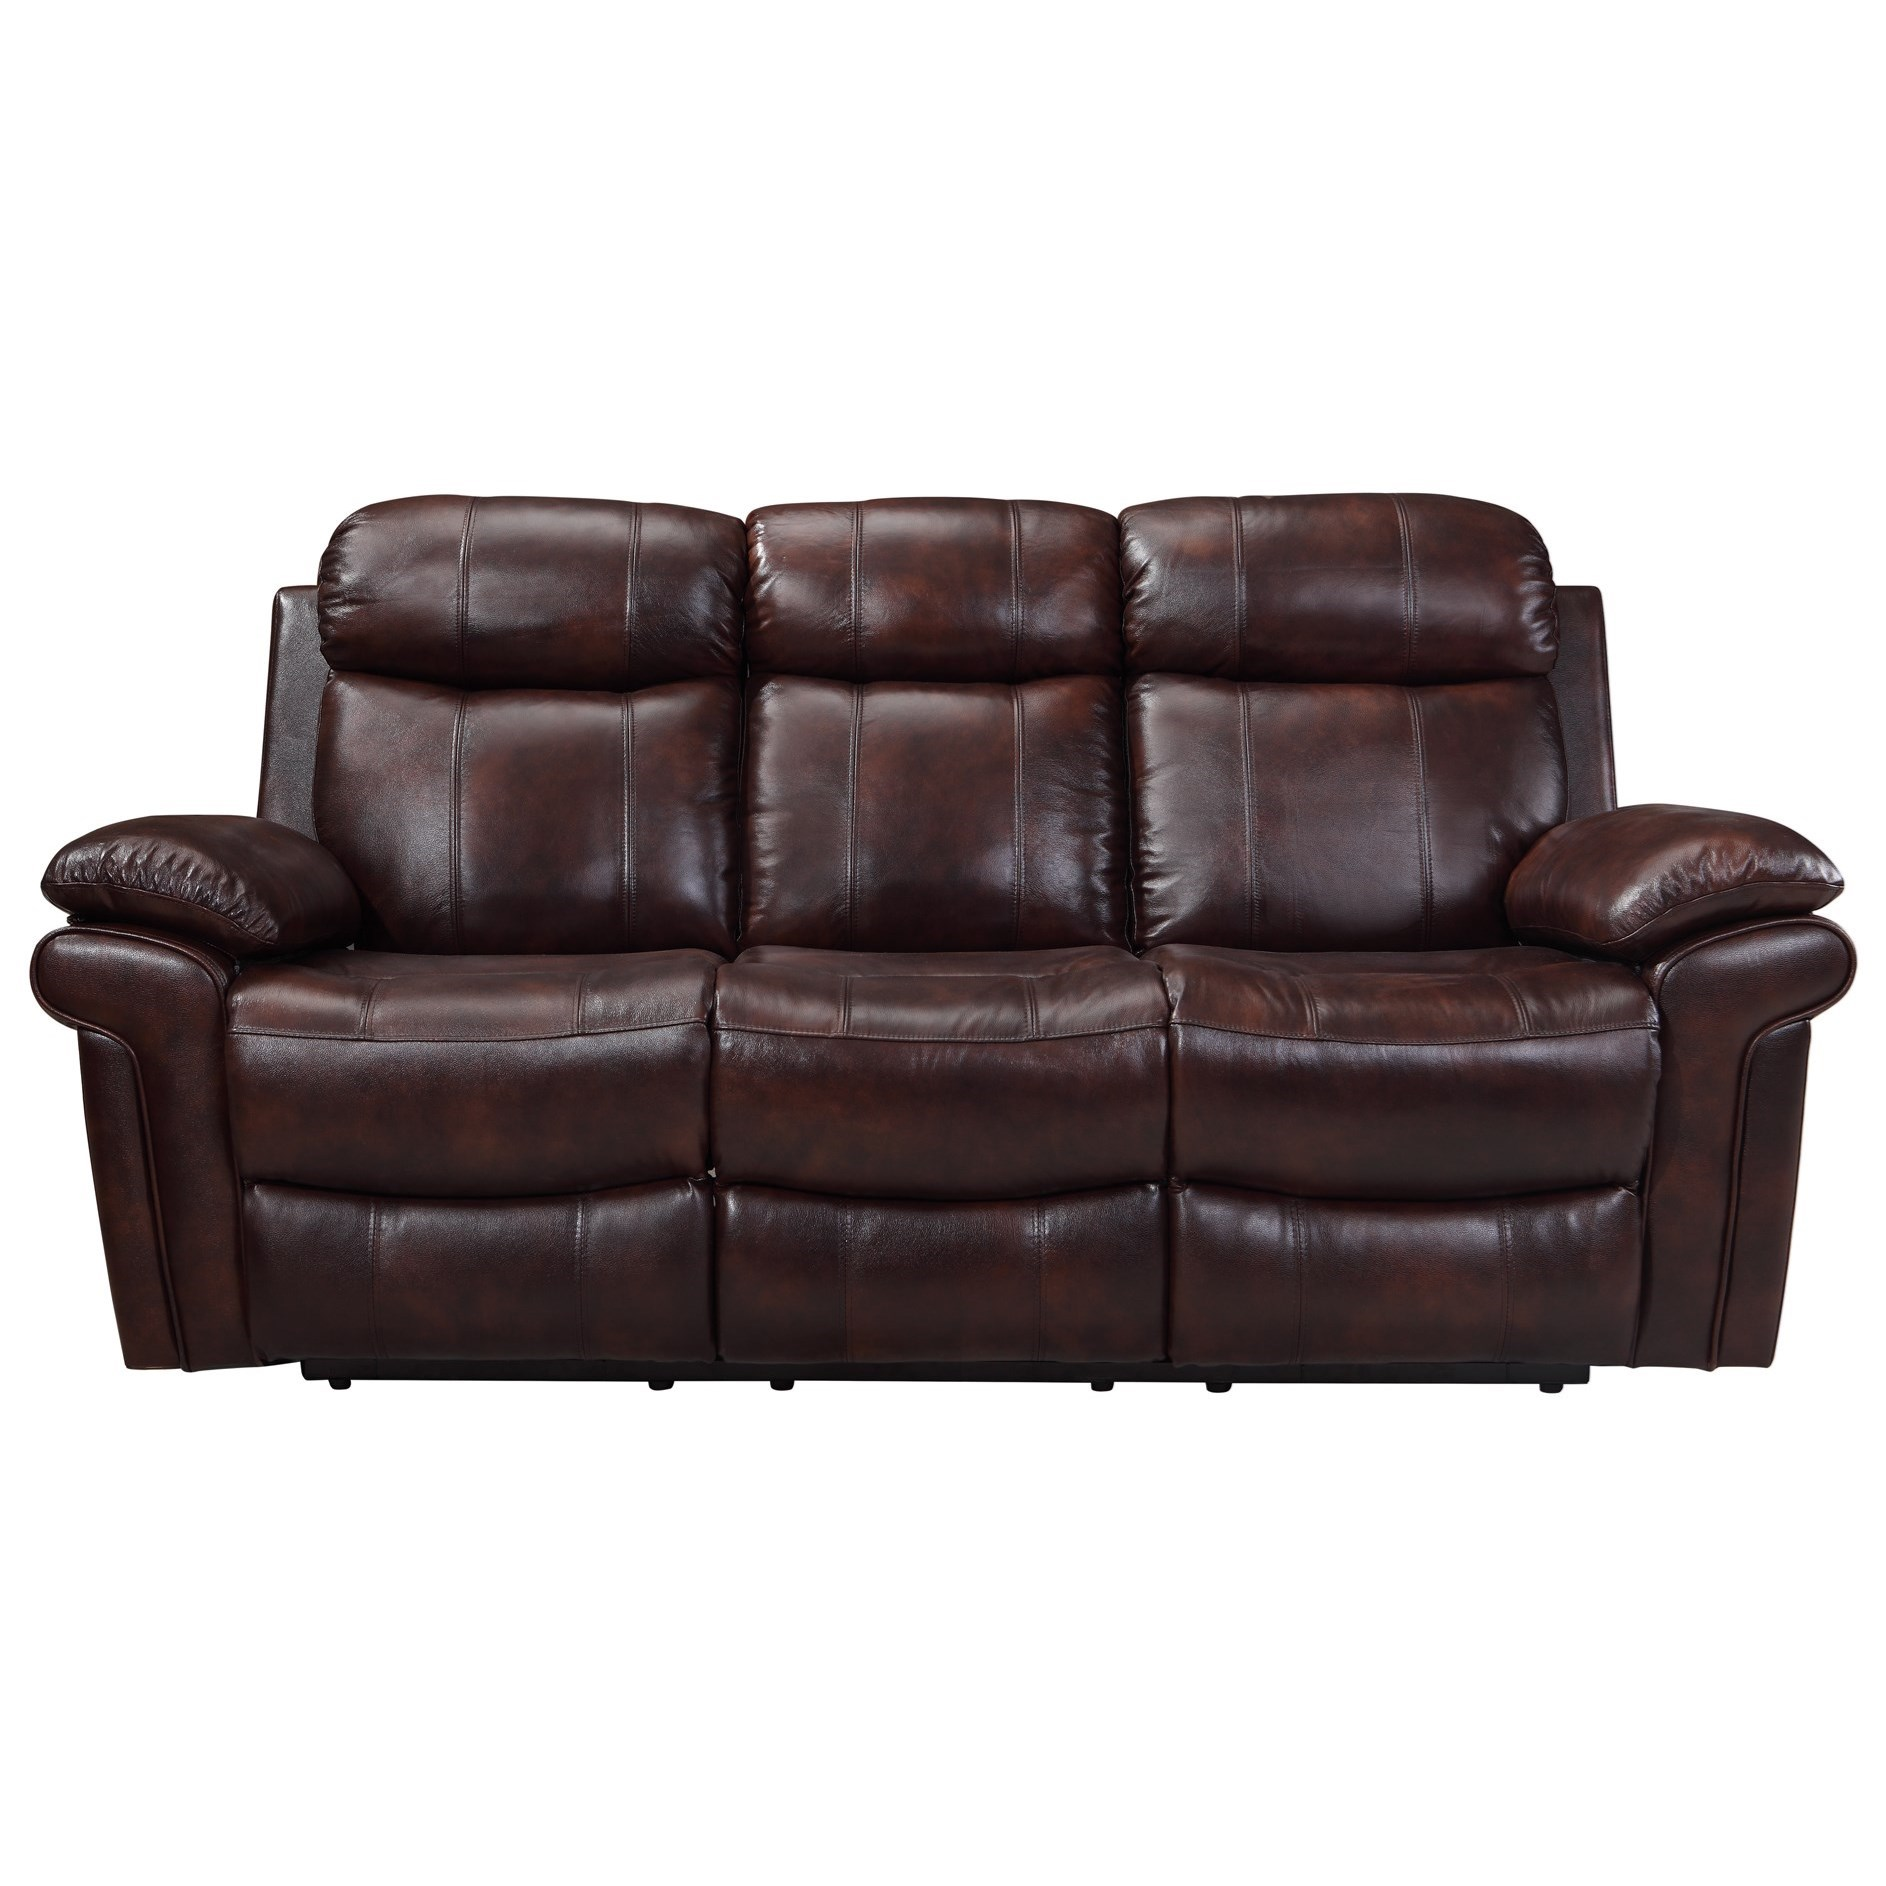 Leather italia usa shae joplin power reclining leather Living room furniture reclining sofa